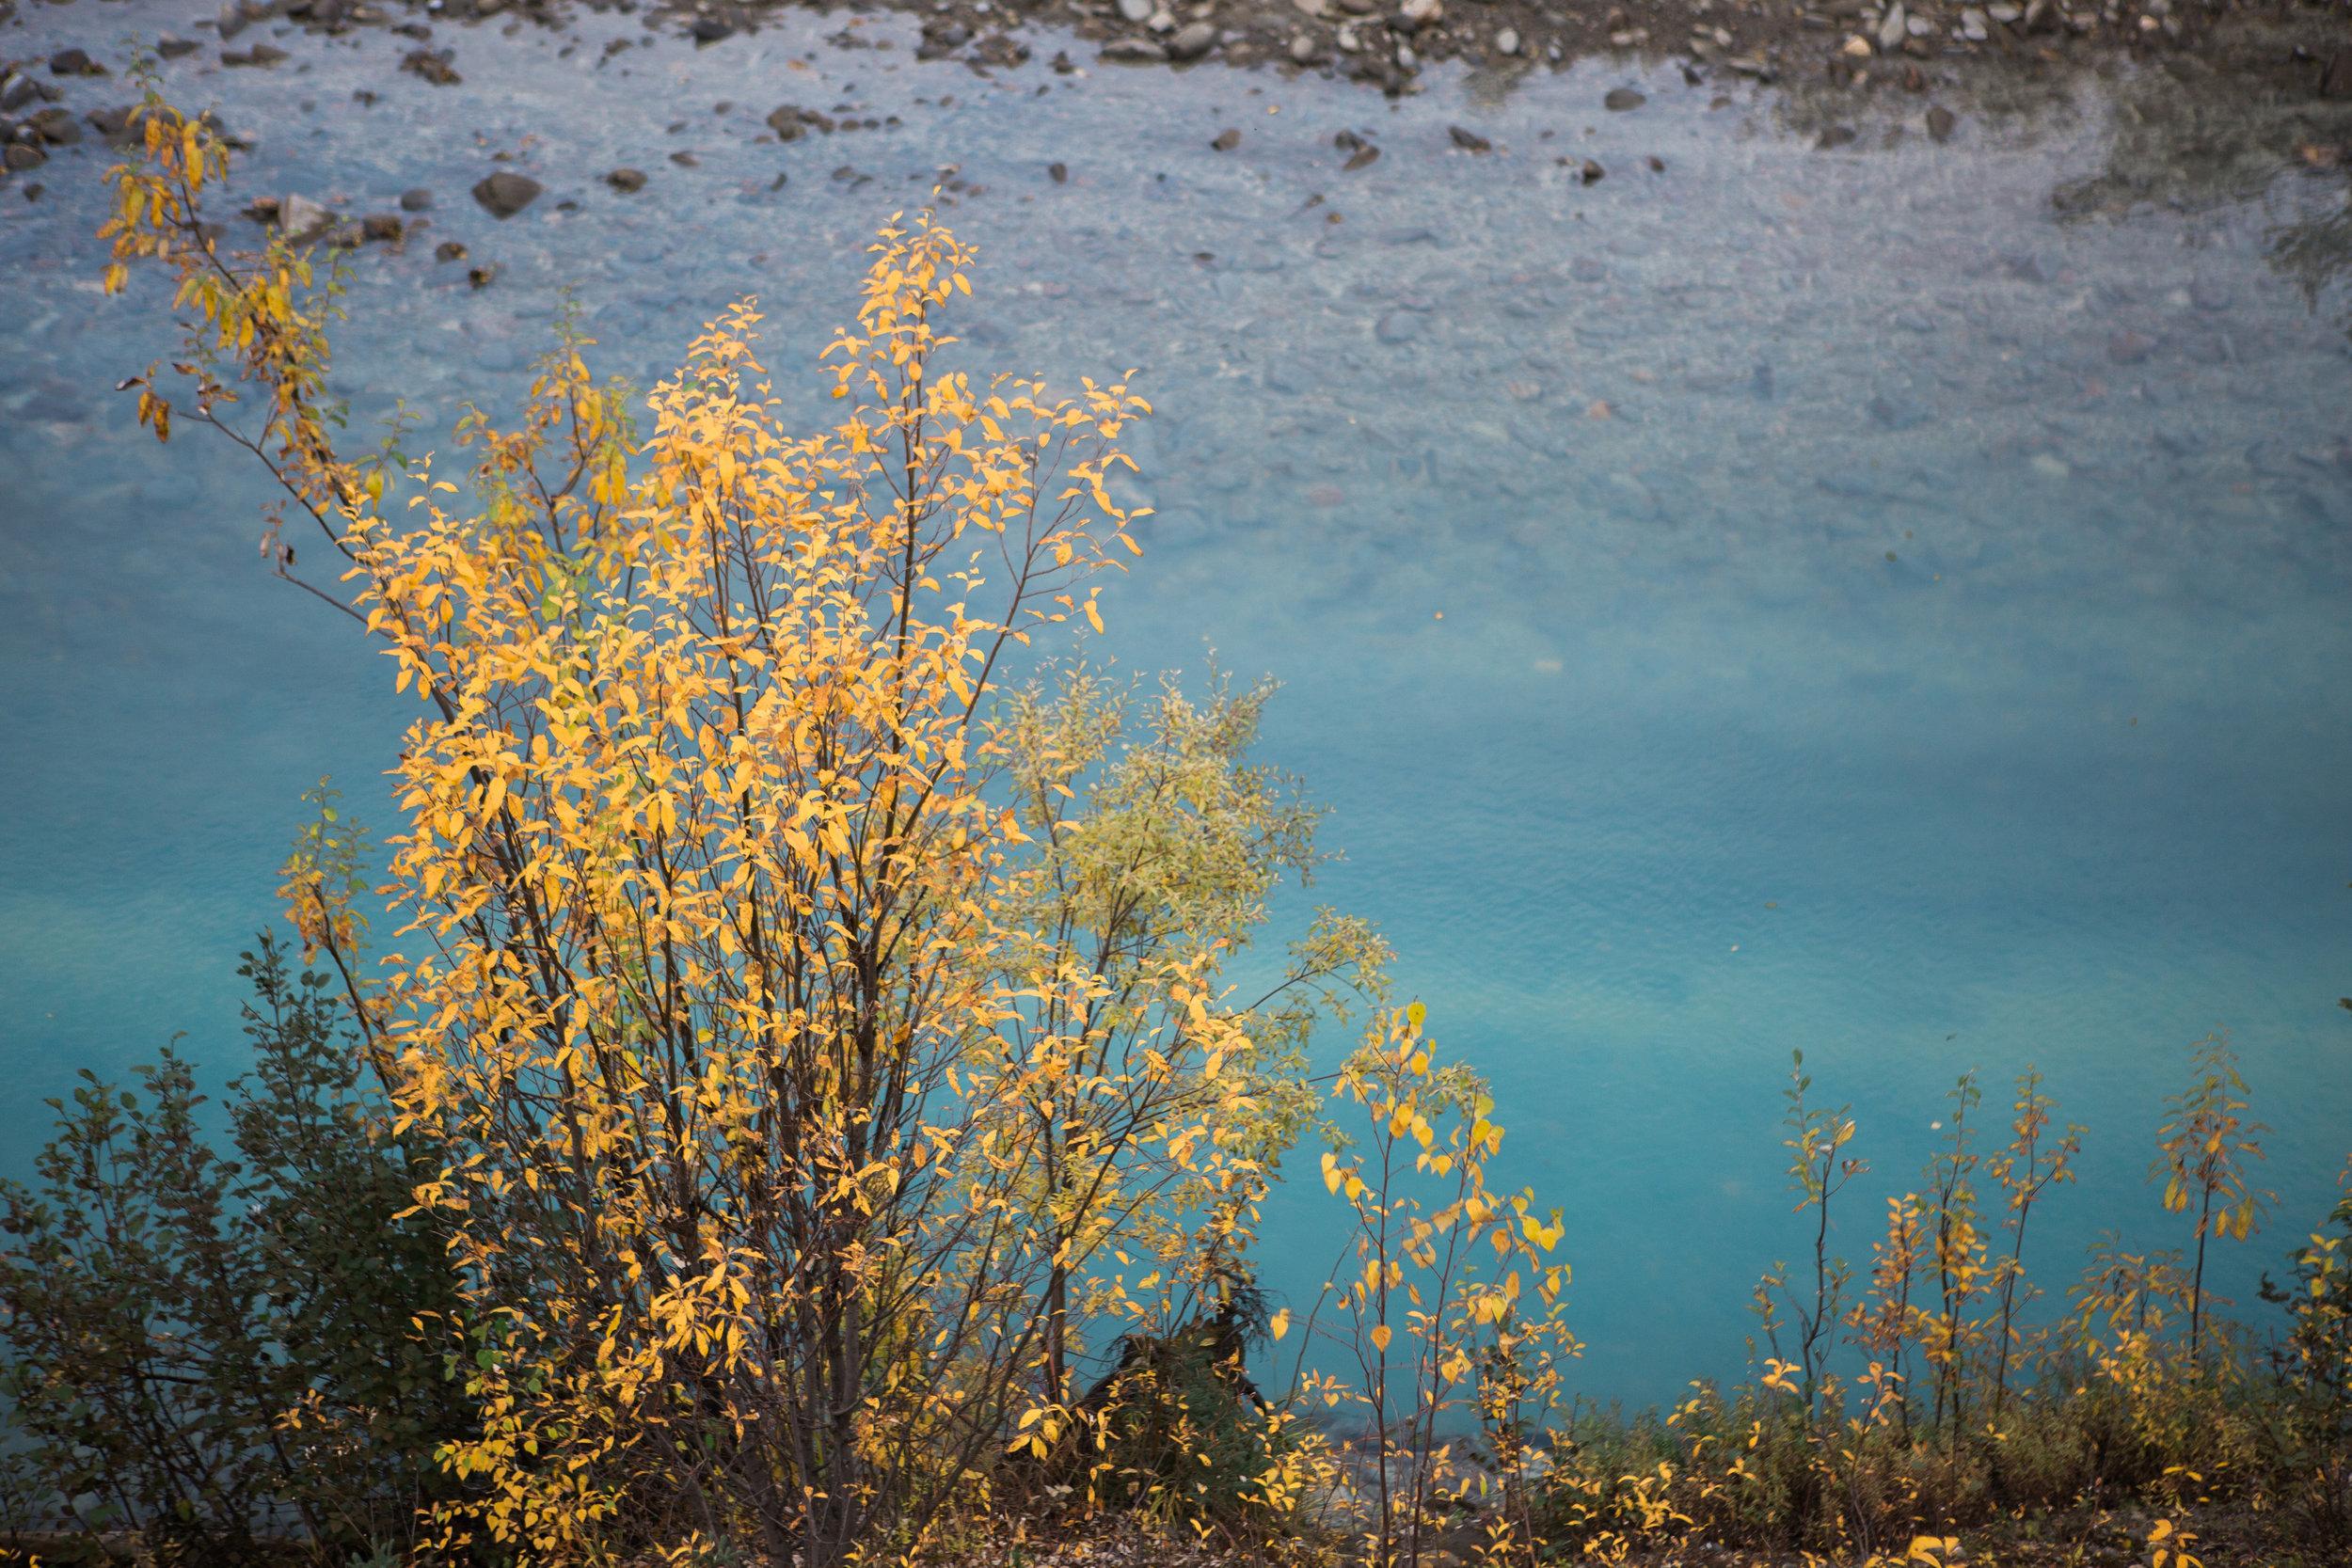 CindyGiovagnoli_Alaska_KoyukukRiver_SukakpakMountain_JimRiver_ArcticCircle_fly_fishing_September-053.jpg